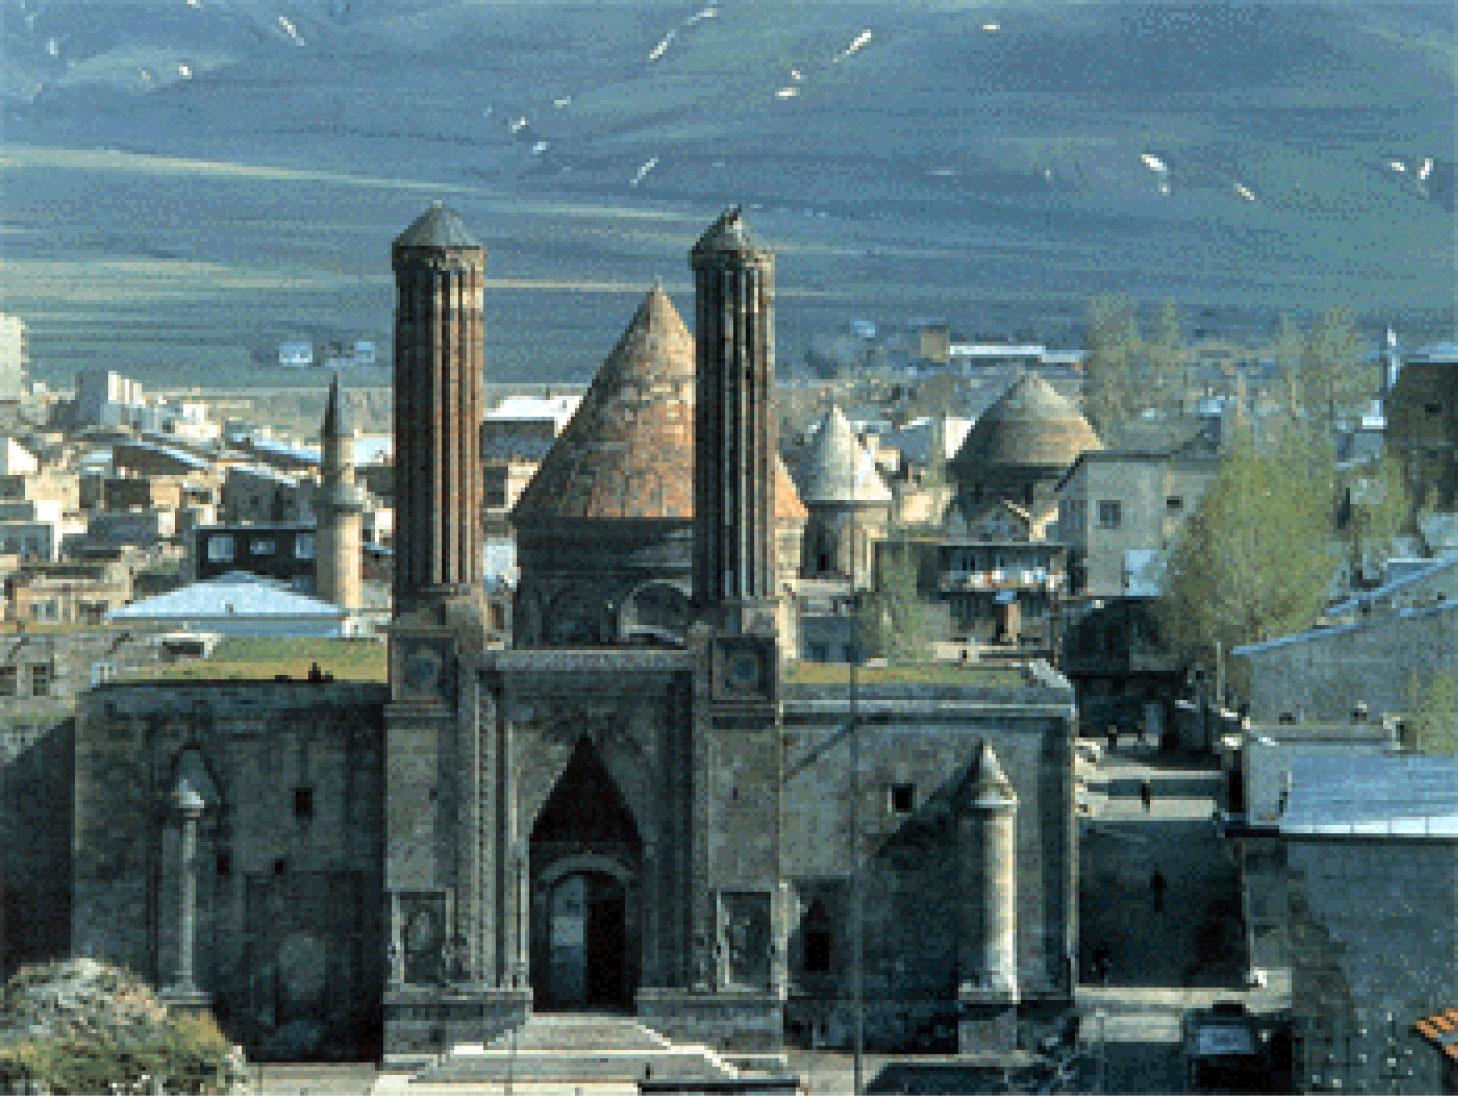 Erzurum Turkey  city images : Cities in World: Erzurum Turkey